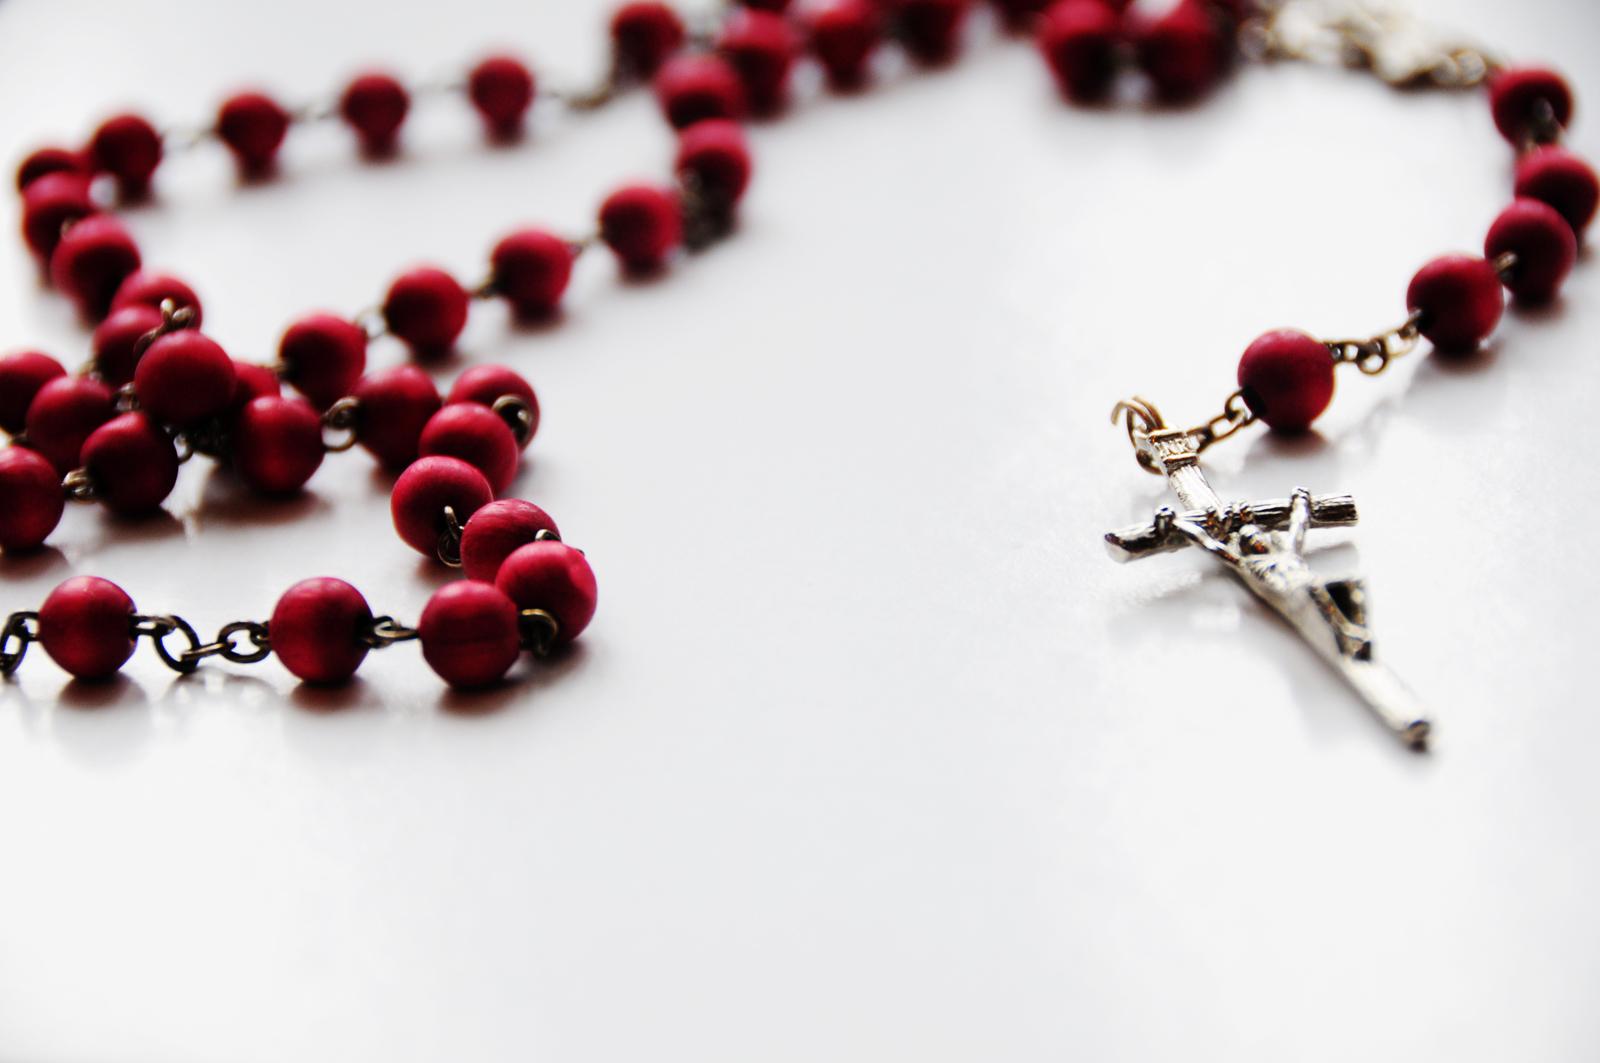 JP II Rosary, galerie Flickr de Jess Pac